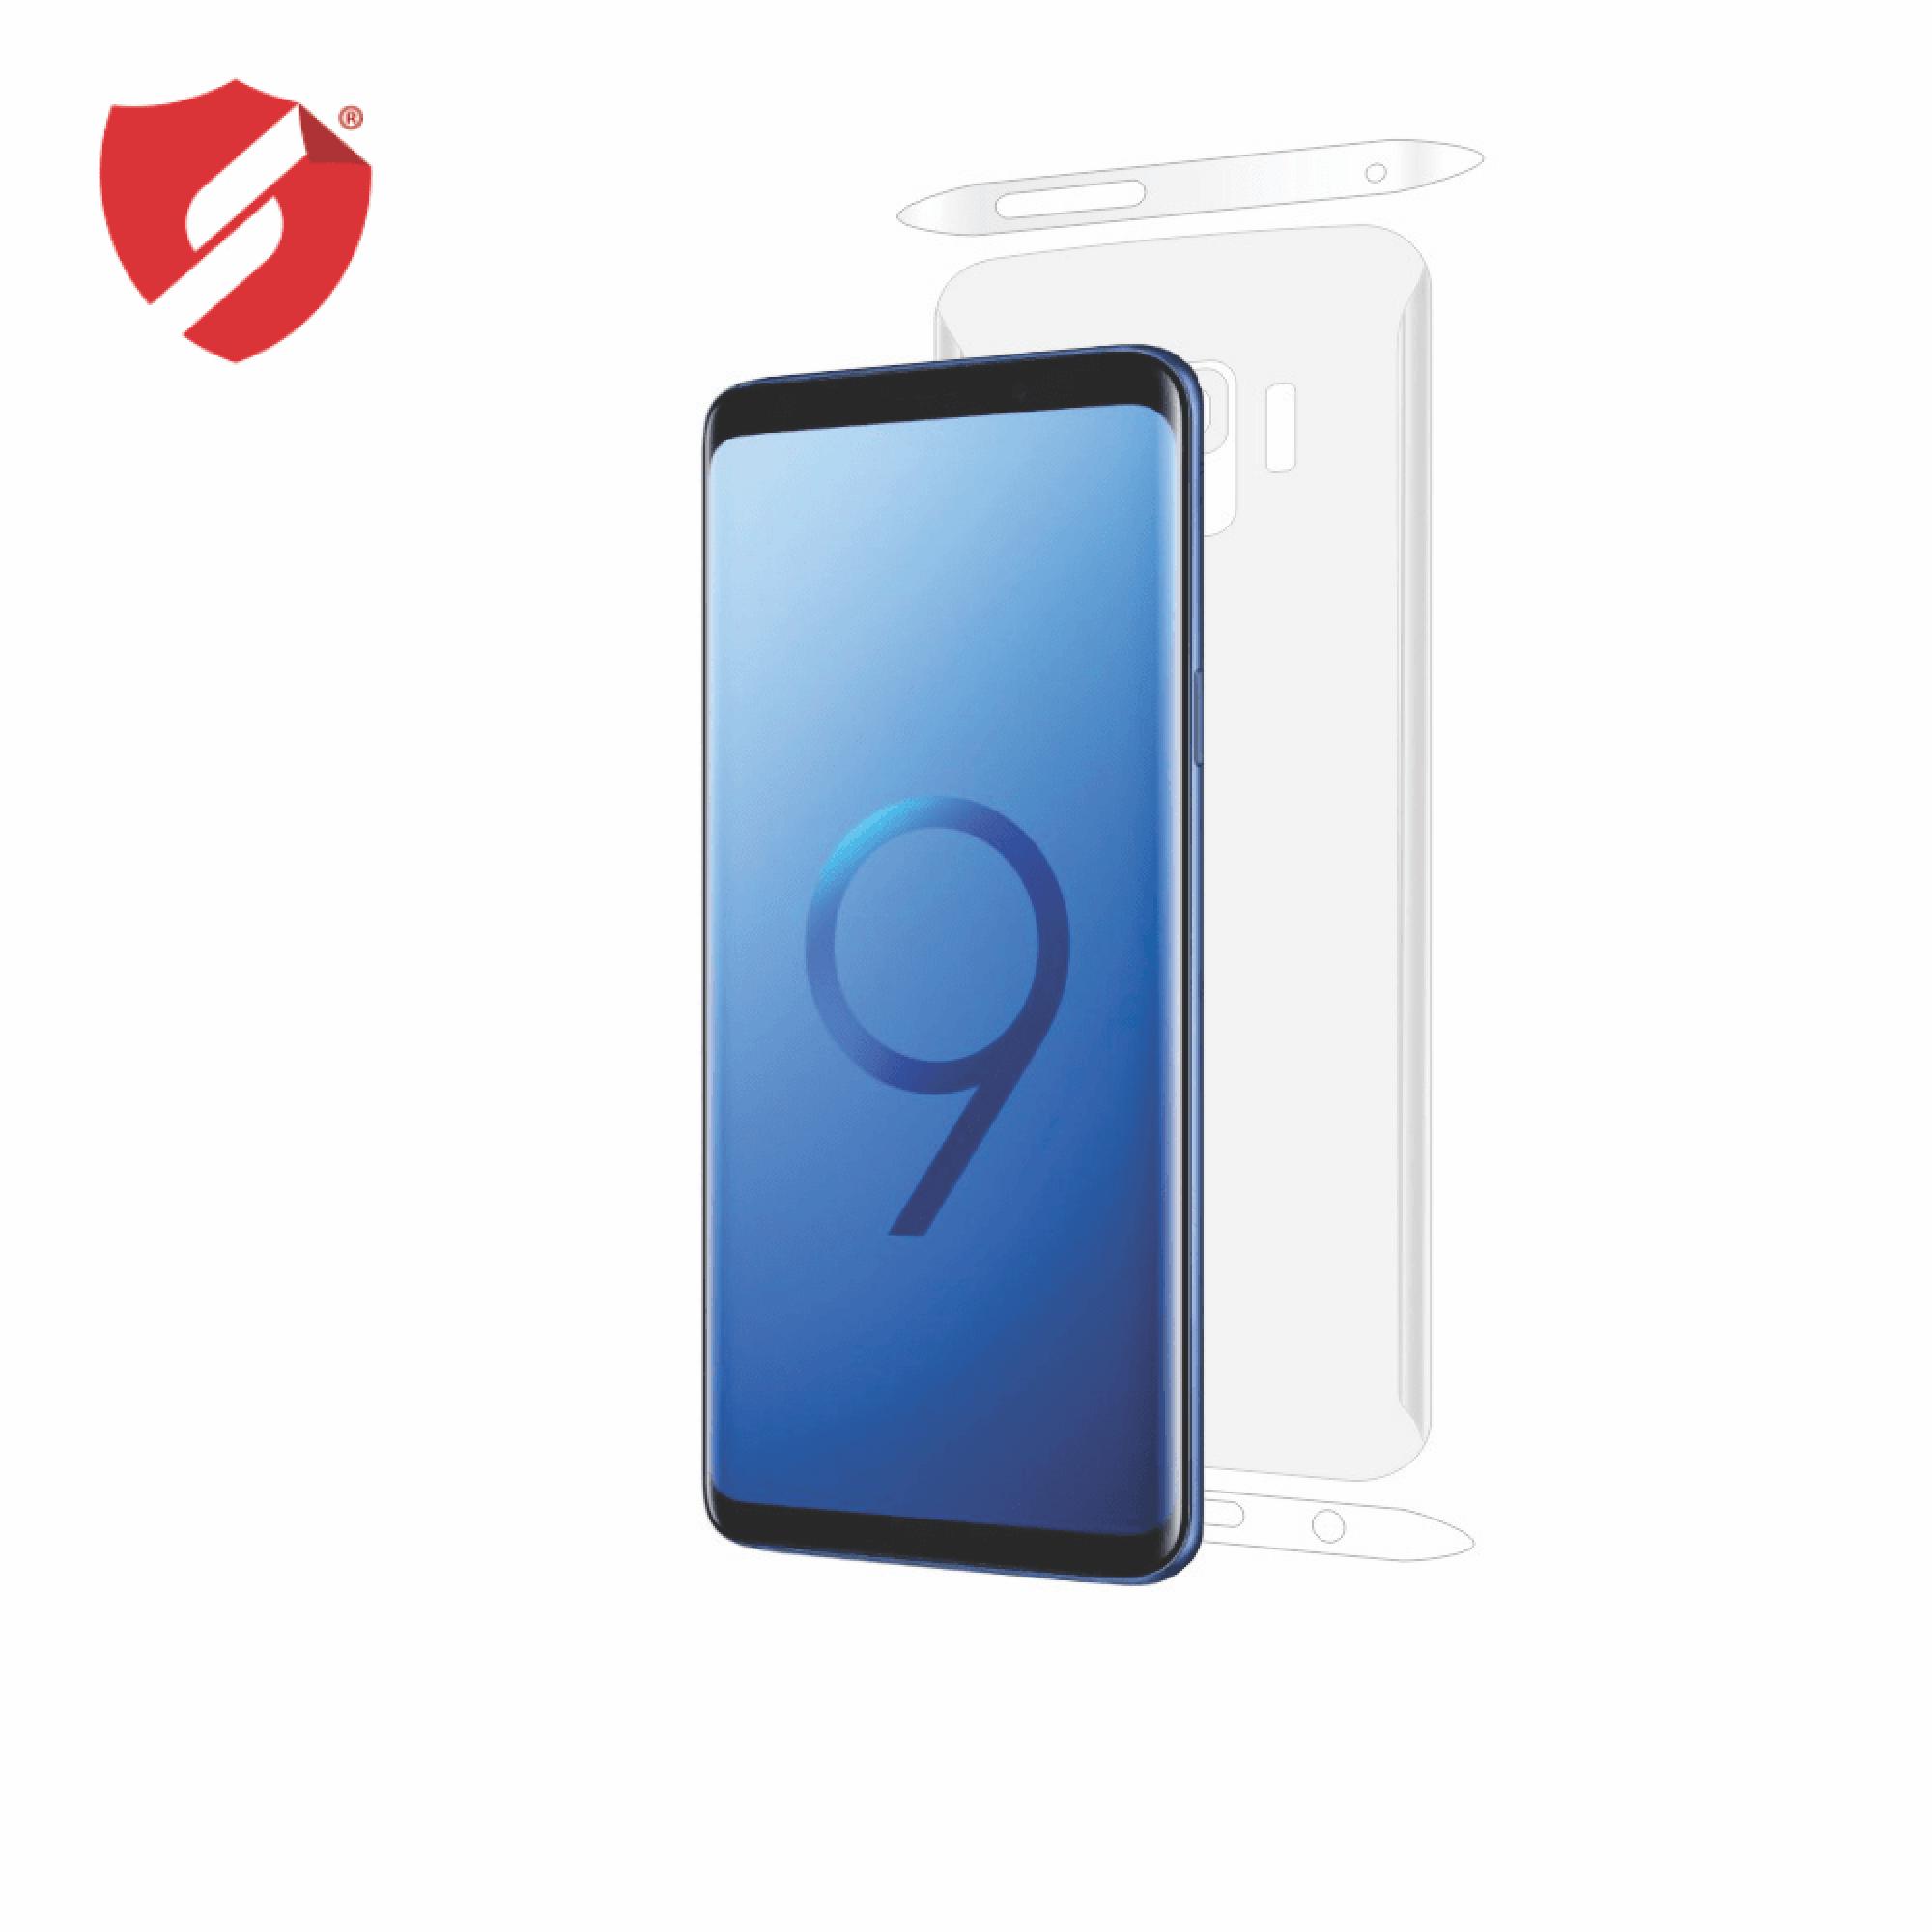 Folie de protectie Smart Protection Samsung Galaxy S9 compatibila cu carcasa Spigen Liquid Air - doar-spate+laterale imagine